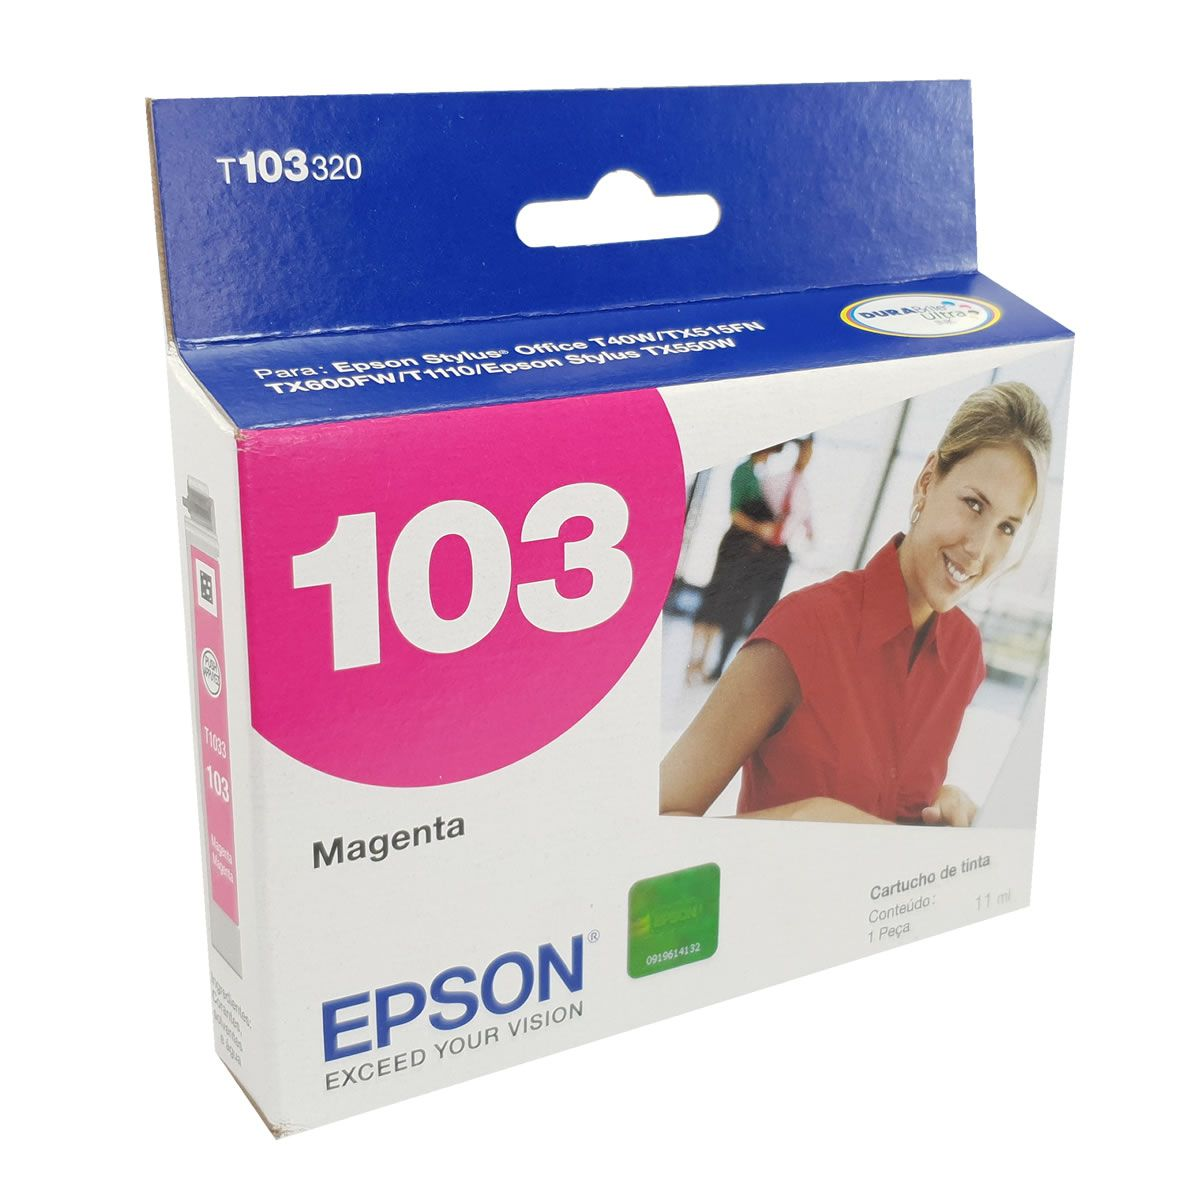 Cartucho EPSON T103320 T103 103 Magenta para T40W TX600FW TX550W